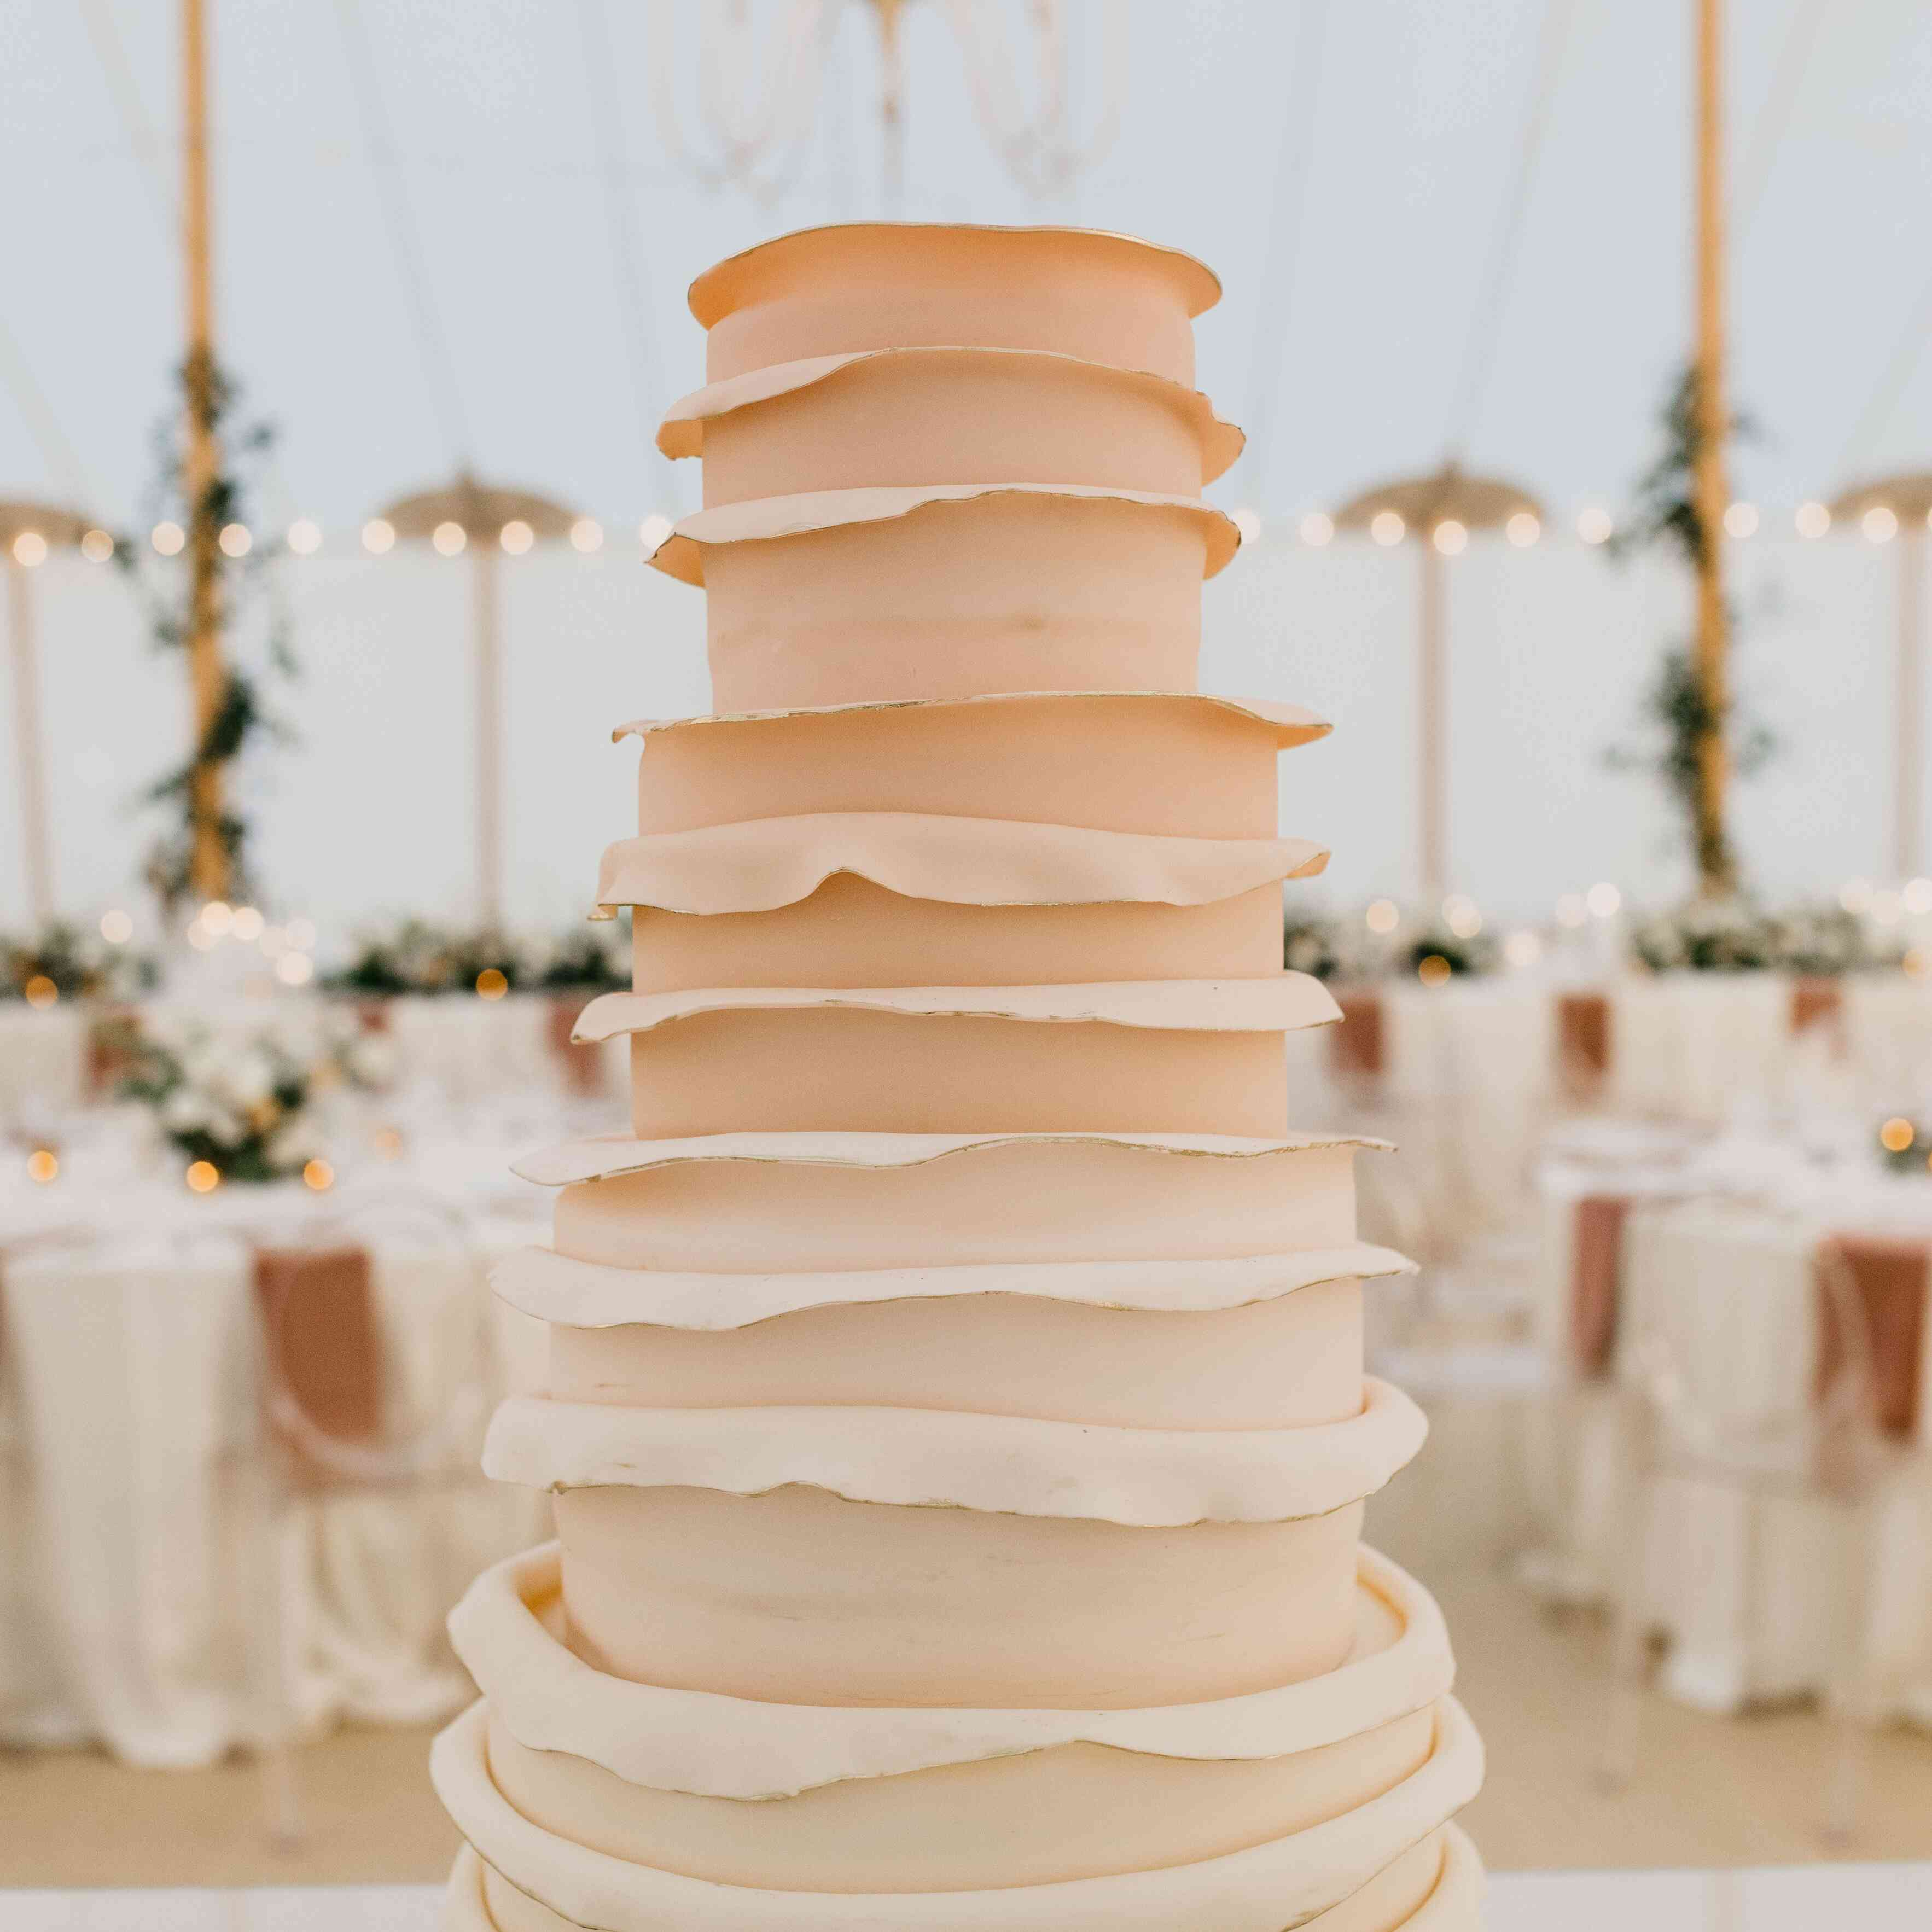 Peach ombre four-tier ruffle layered wedding cake